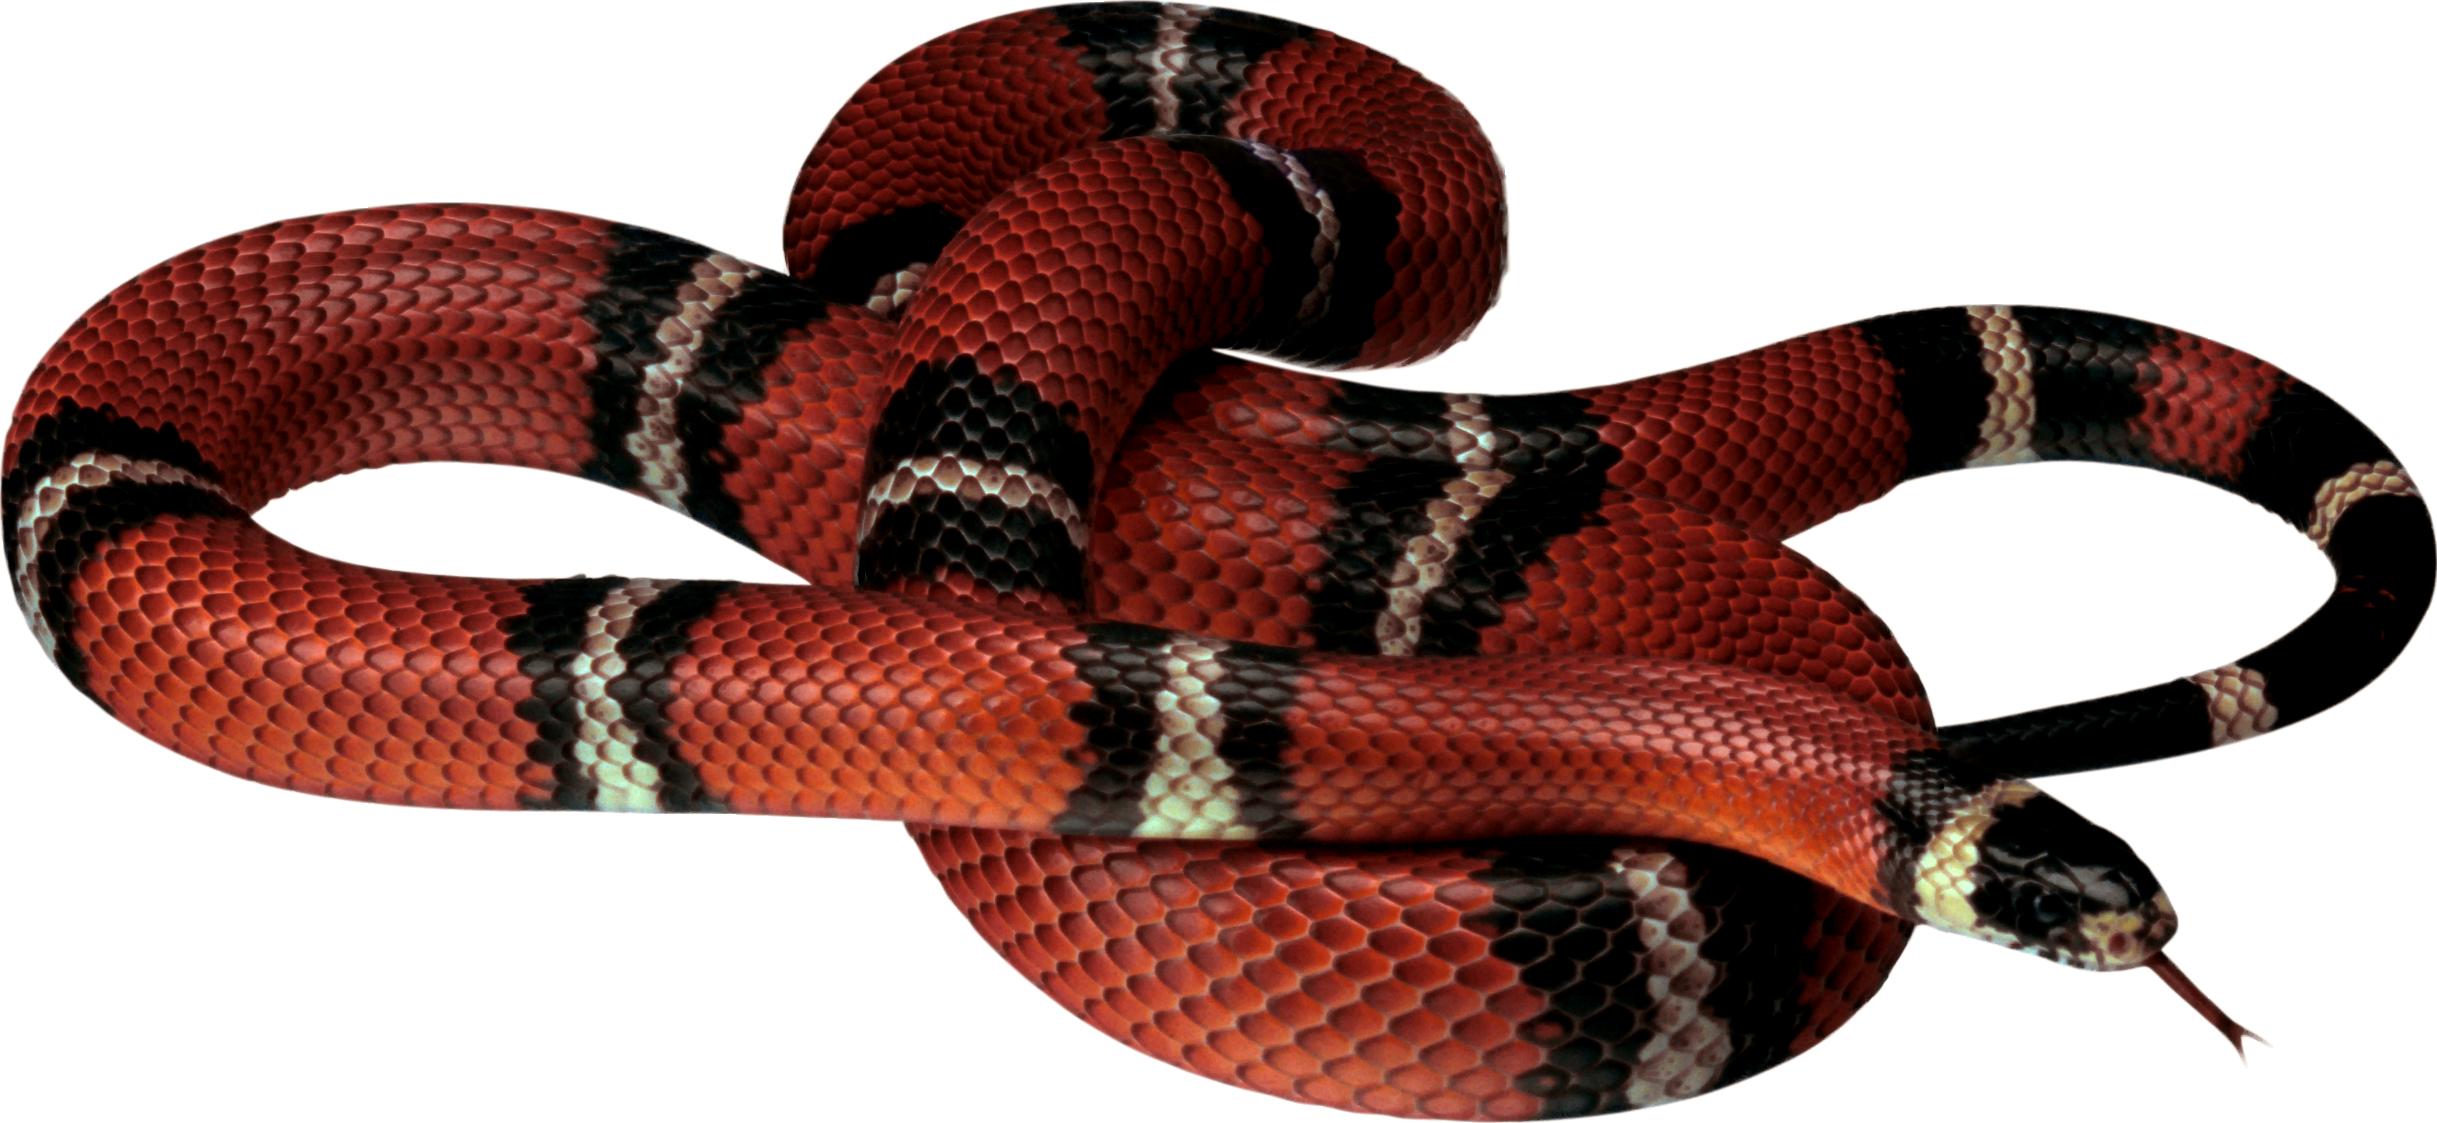 Image qygjxz . Snake clipart sword